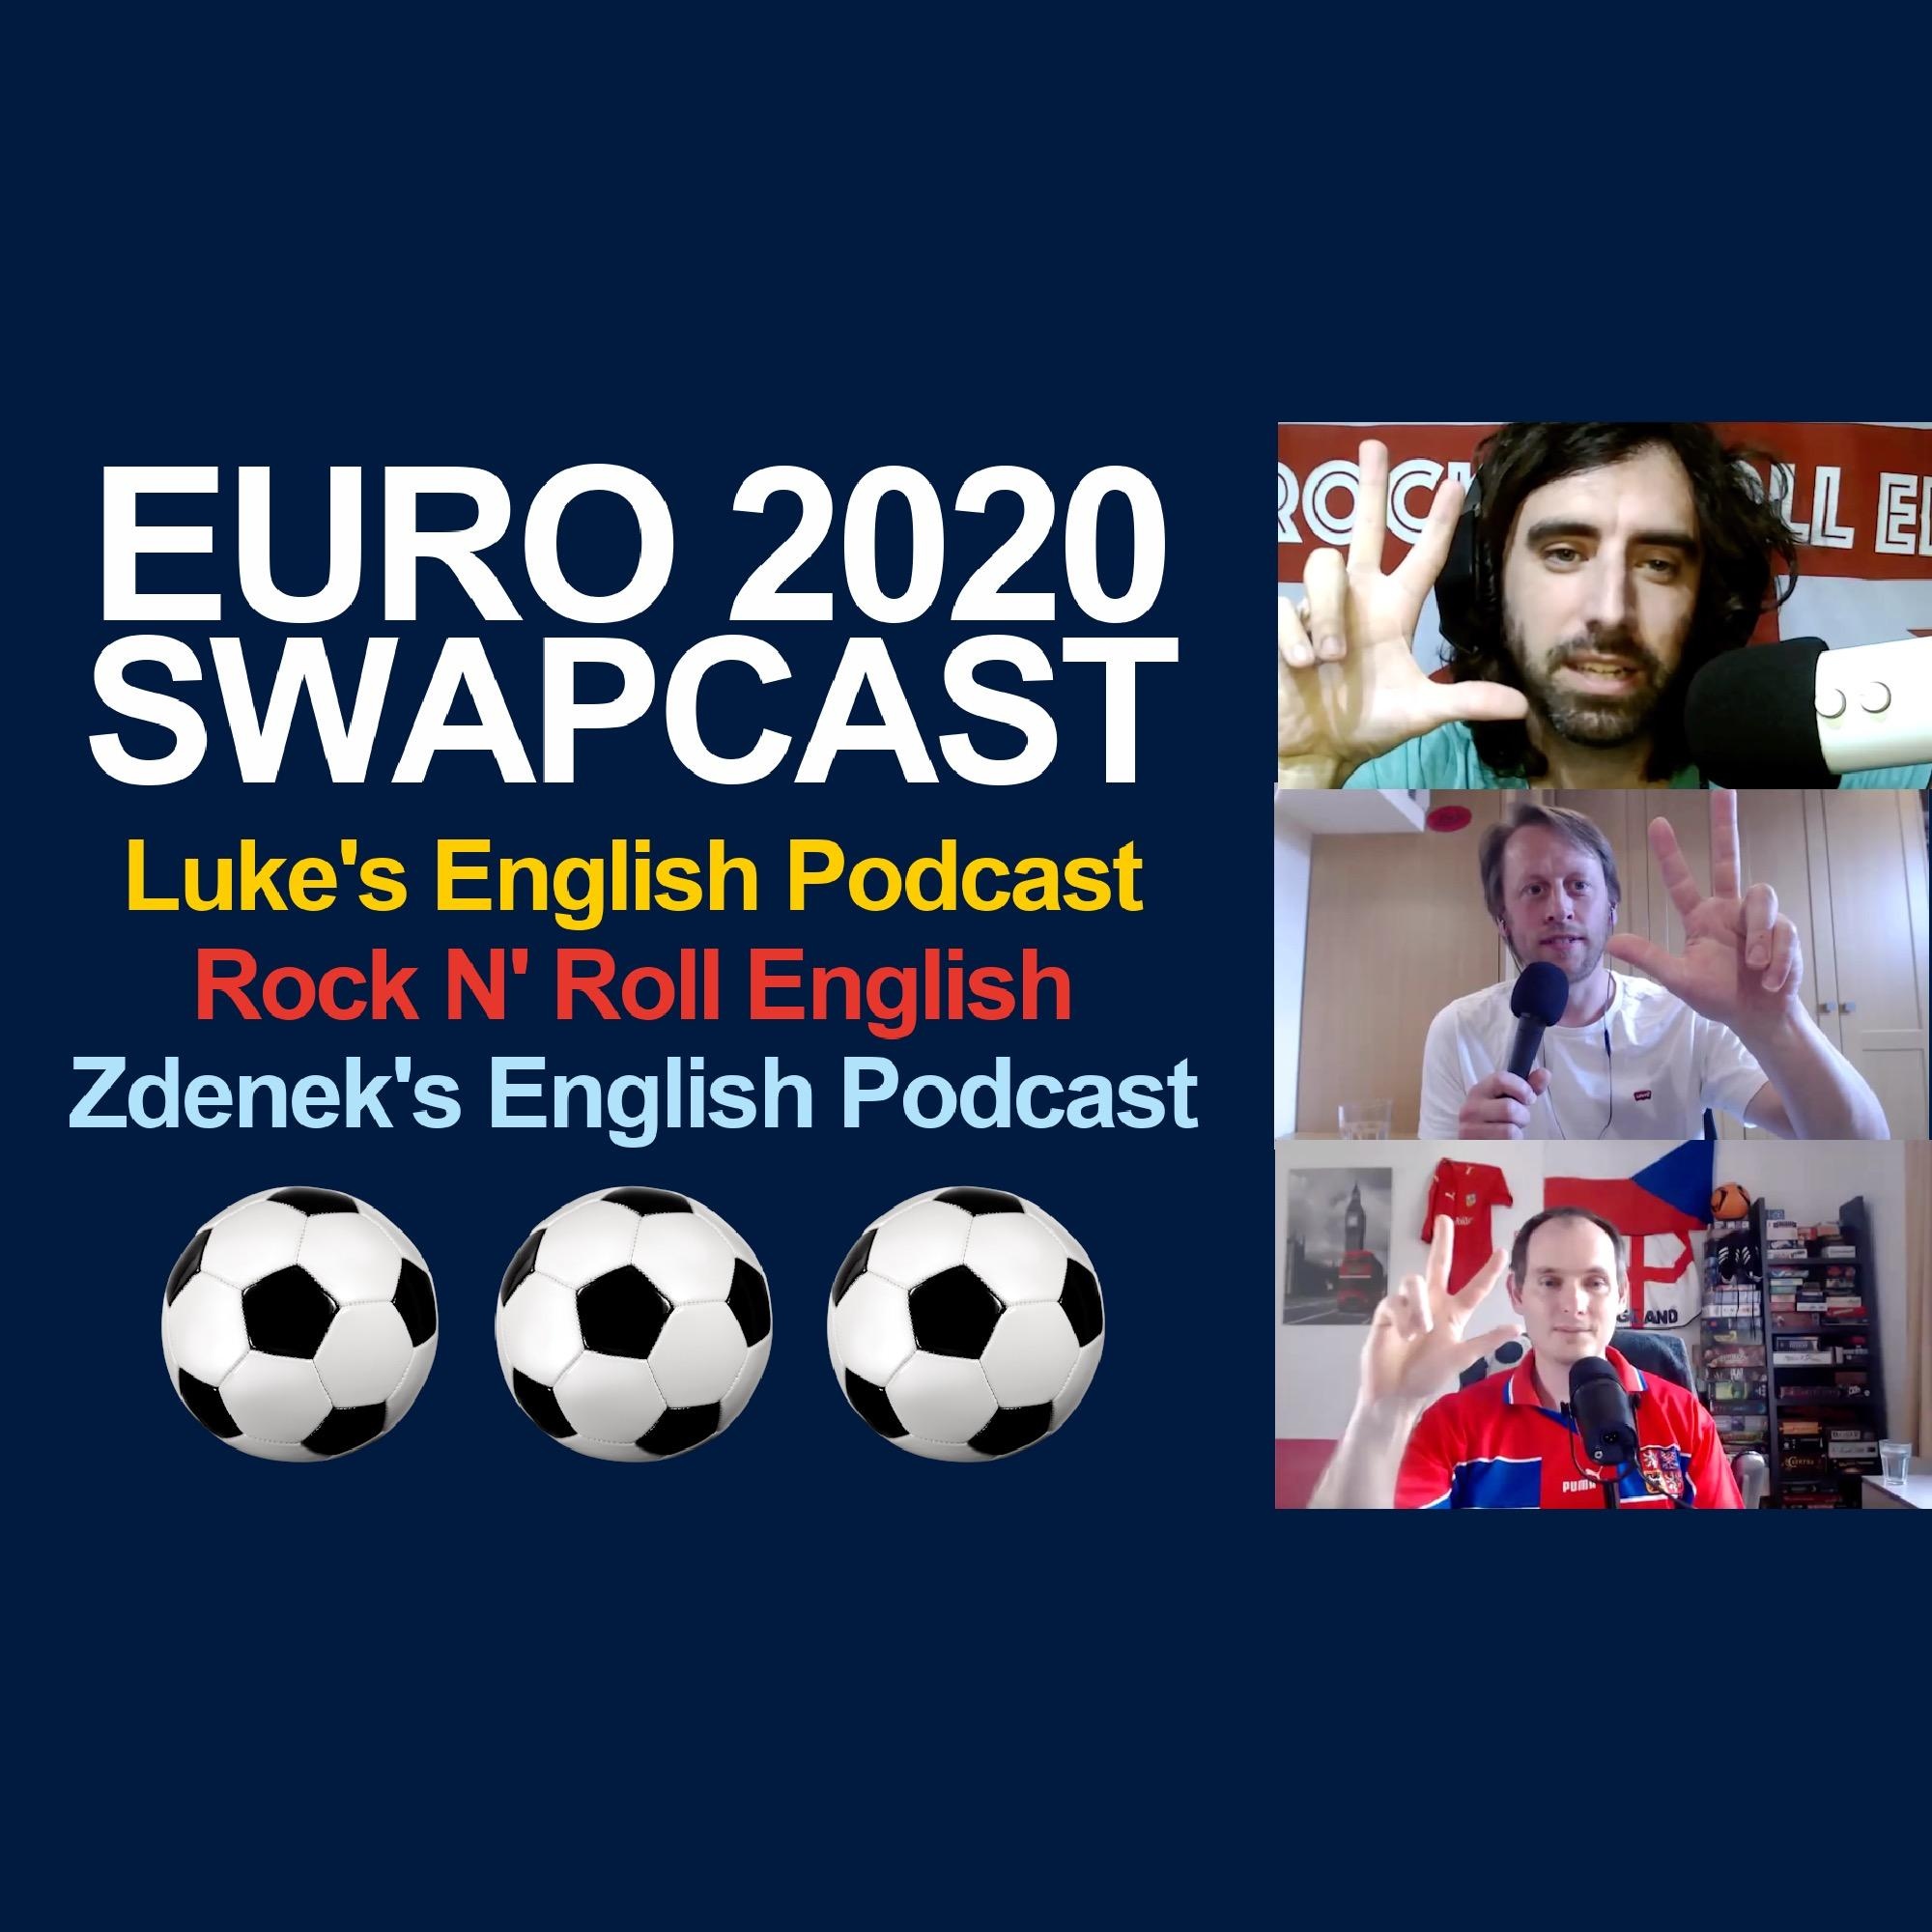 BONUS: [1/2] EURO2020 Swapcast with Martin Johnston (RnR) & Zdenek Lukas (ZEP)